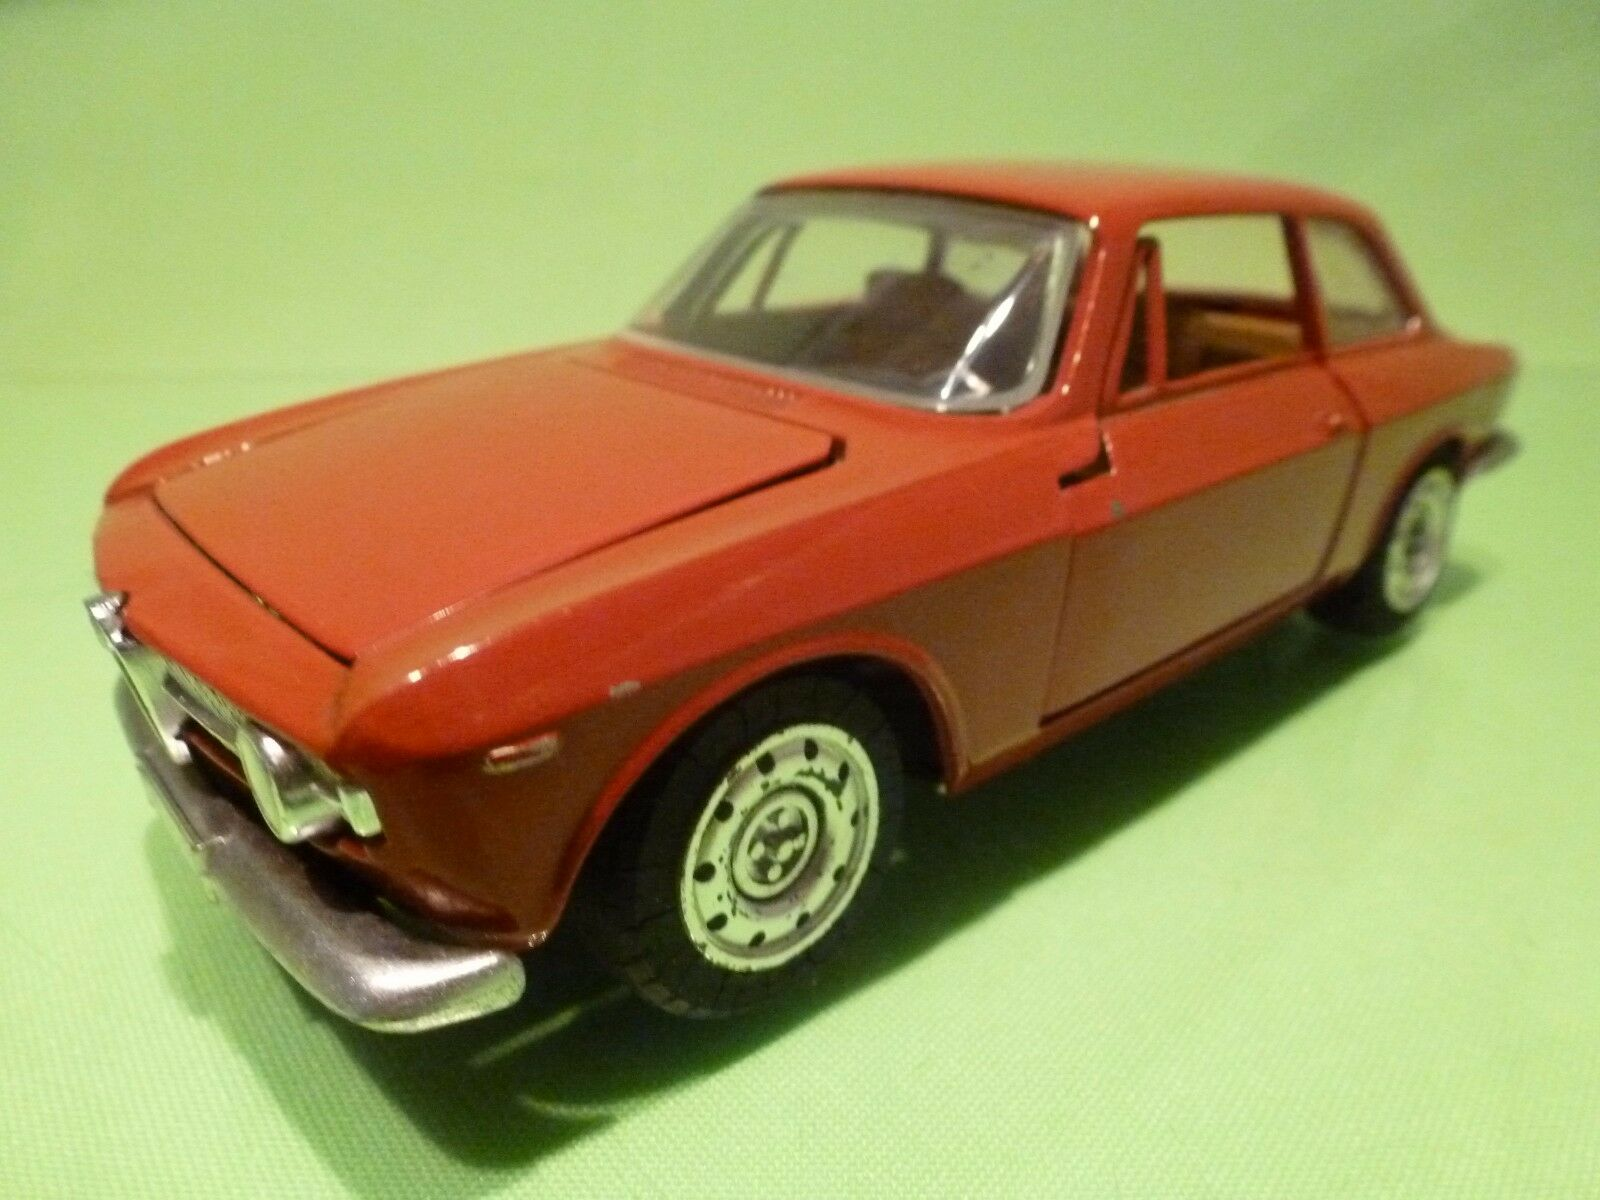 TOGI 8 65 ALFA ROMEO GIULIA GT SPRINT SPRINT SPRINT - RED 1 23 - GOOD CONDITION 3ac29a